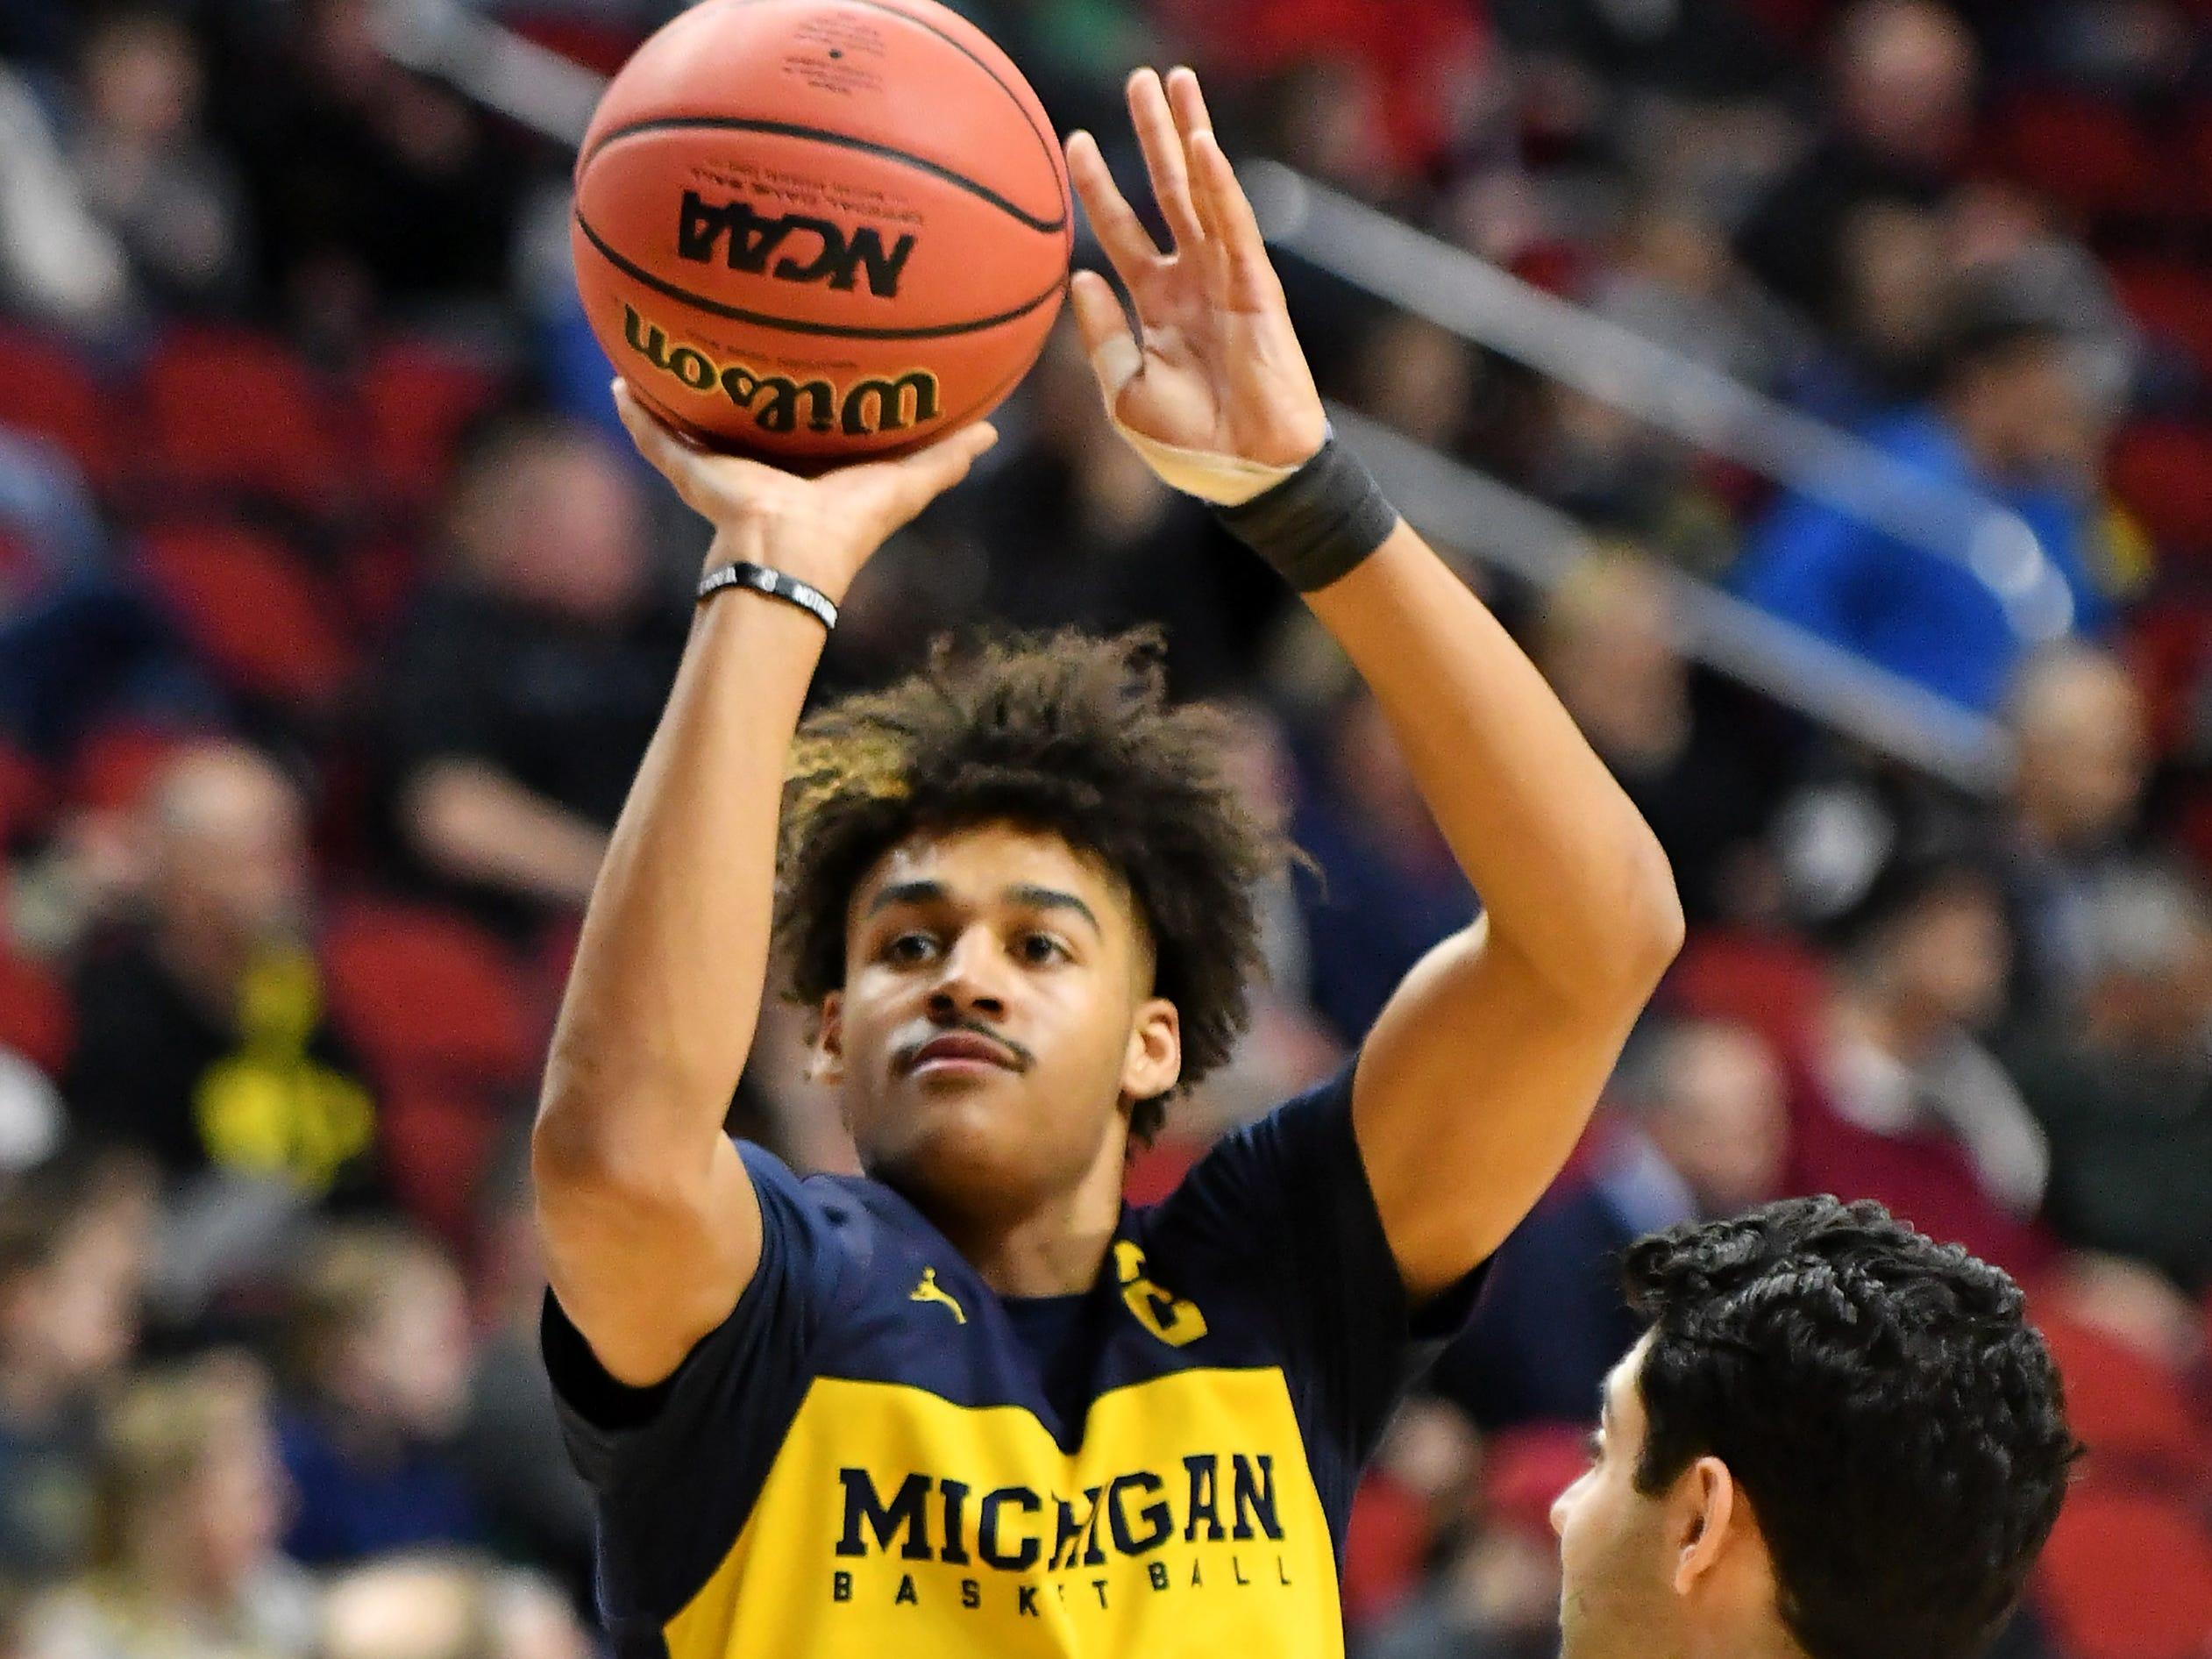 Michigan guard Jordan Poole takes a shot at practice.